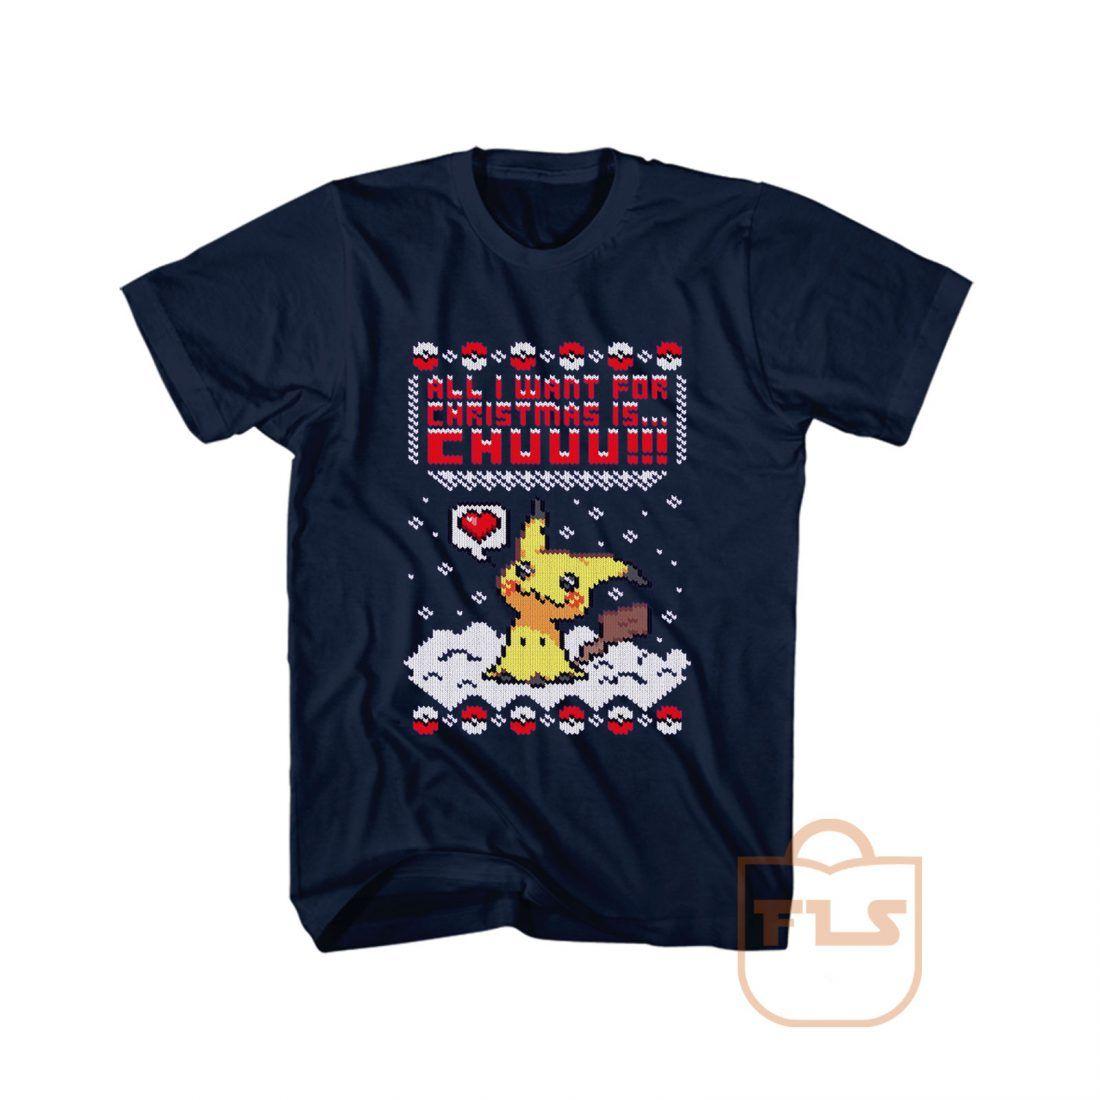 All I Want For Christmas Is Pikachu T Shirt T Shirt Shirts High Quality Shirt